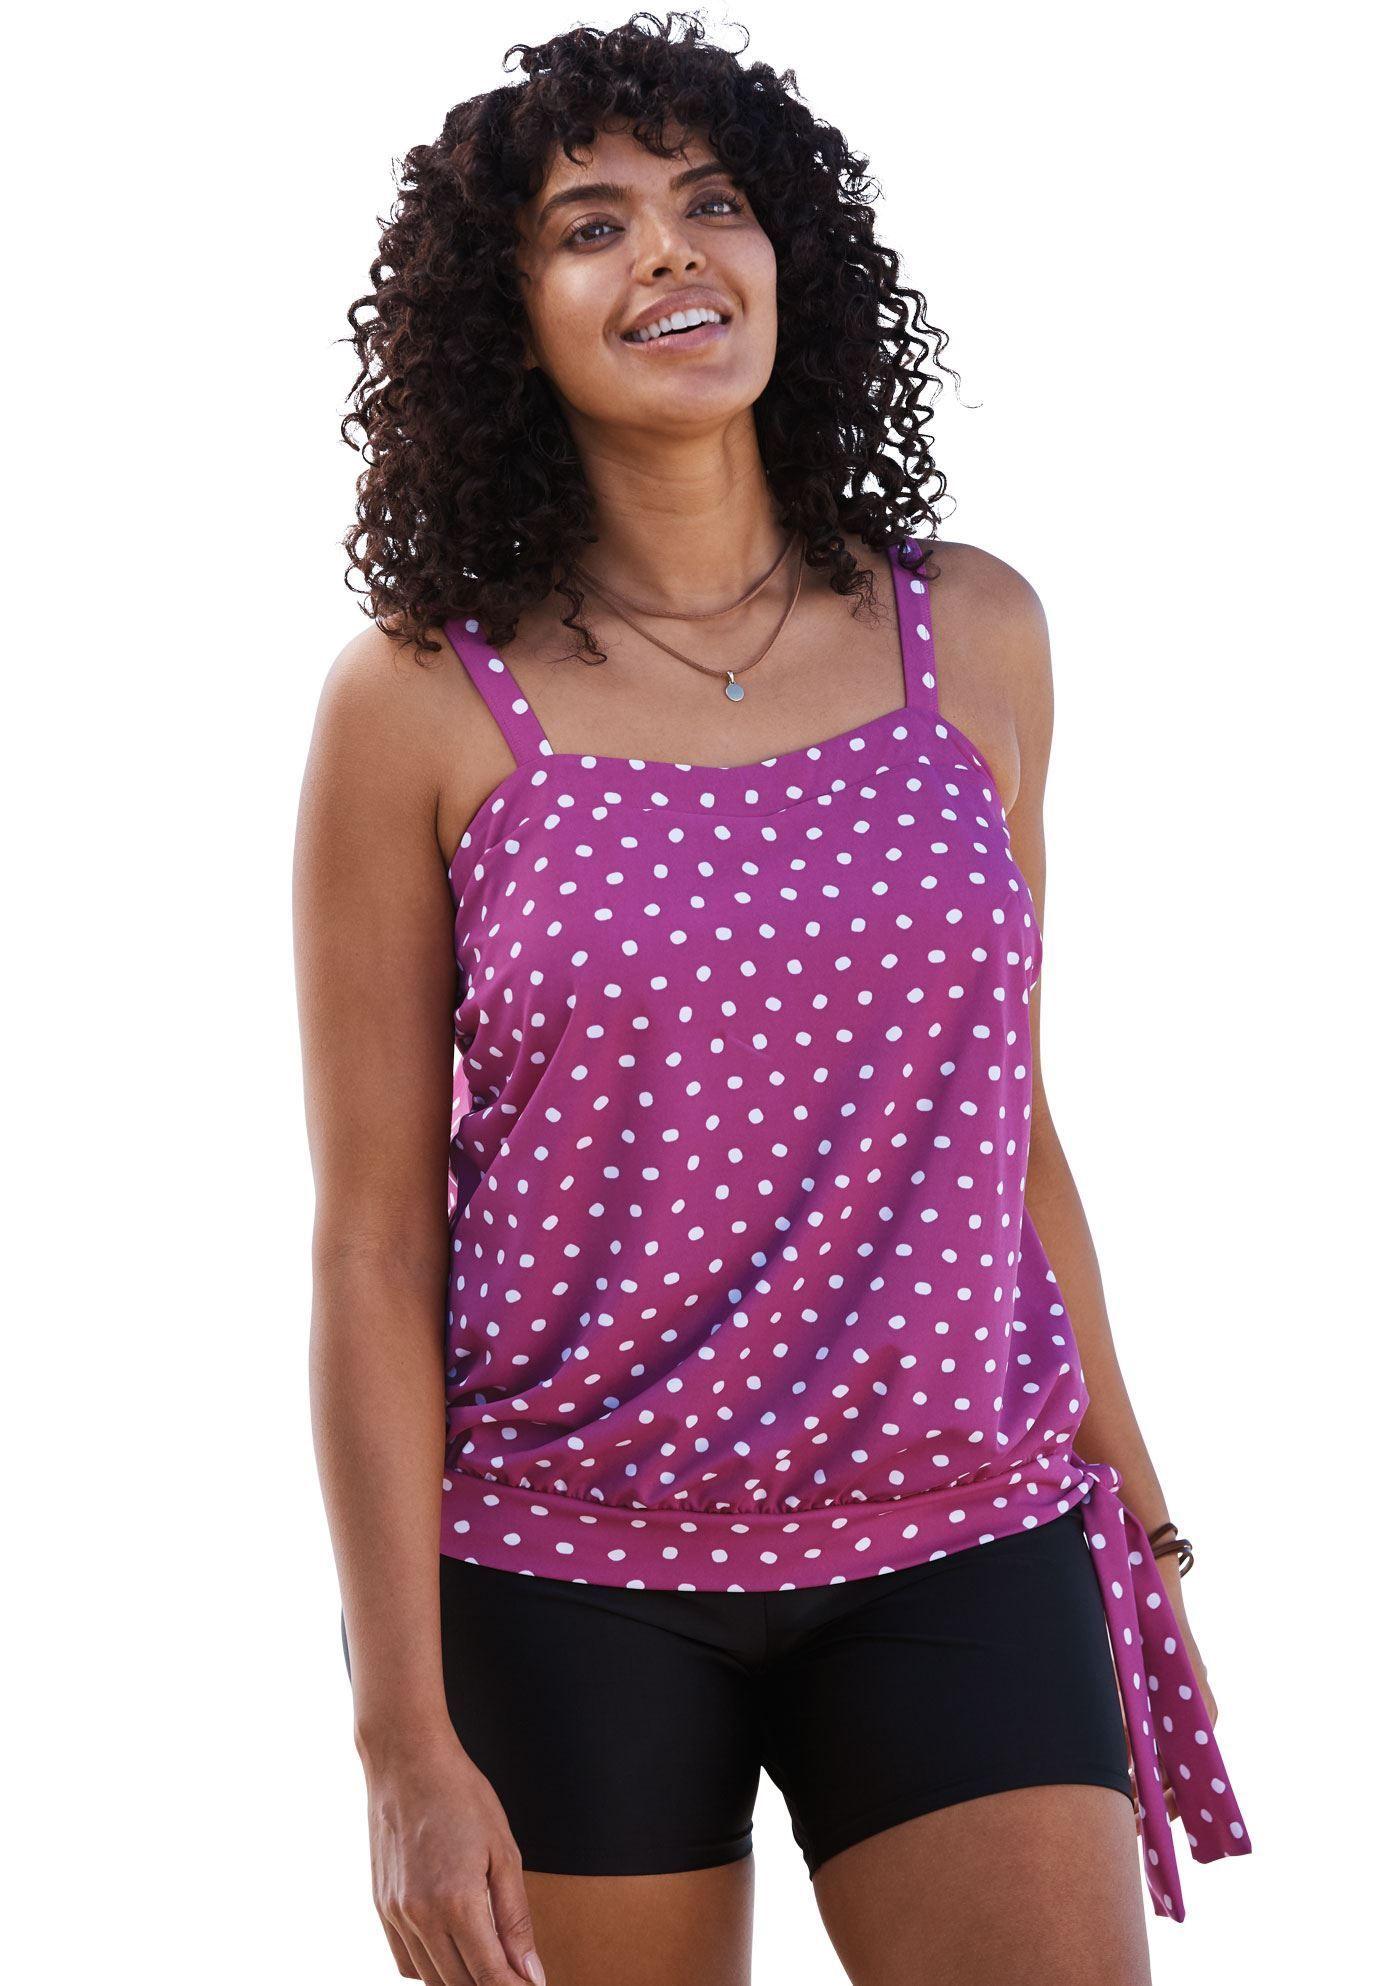 34ed37dc3d5 Side-tie #tankini top with blouson by Swim 365 - Women's Plus Size Clothing